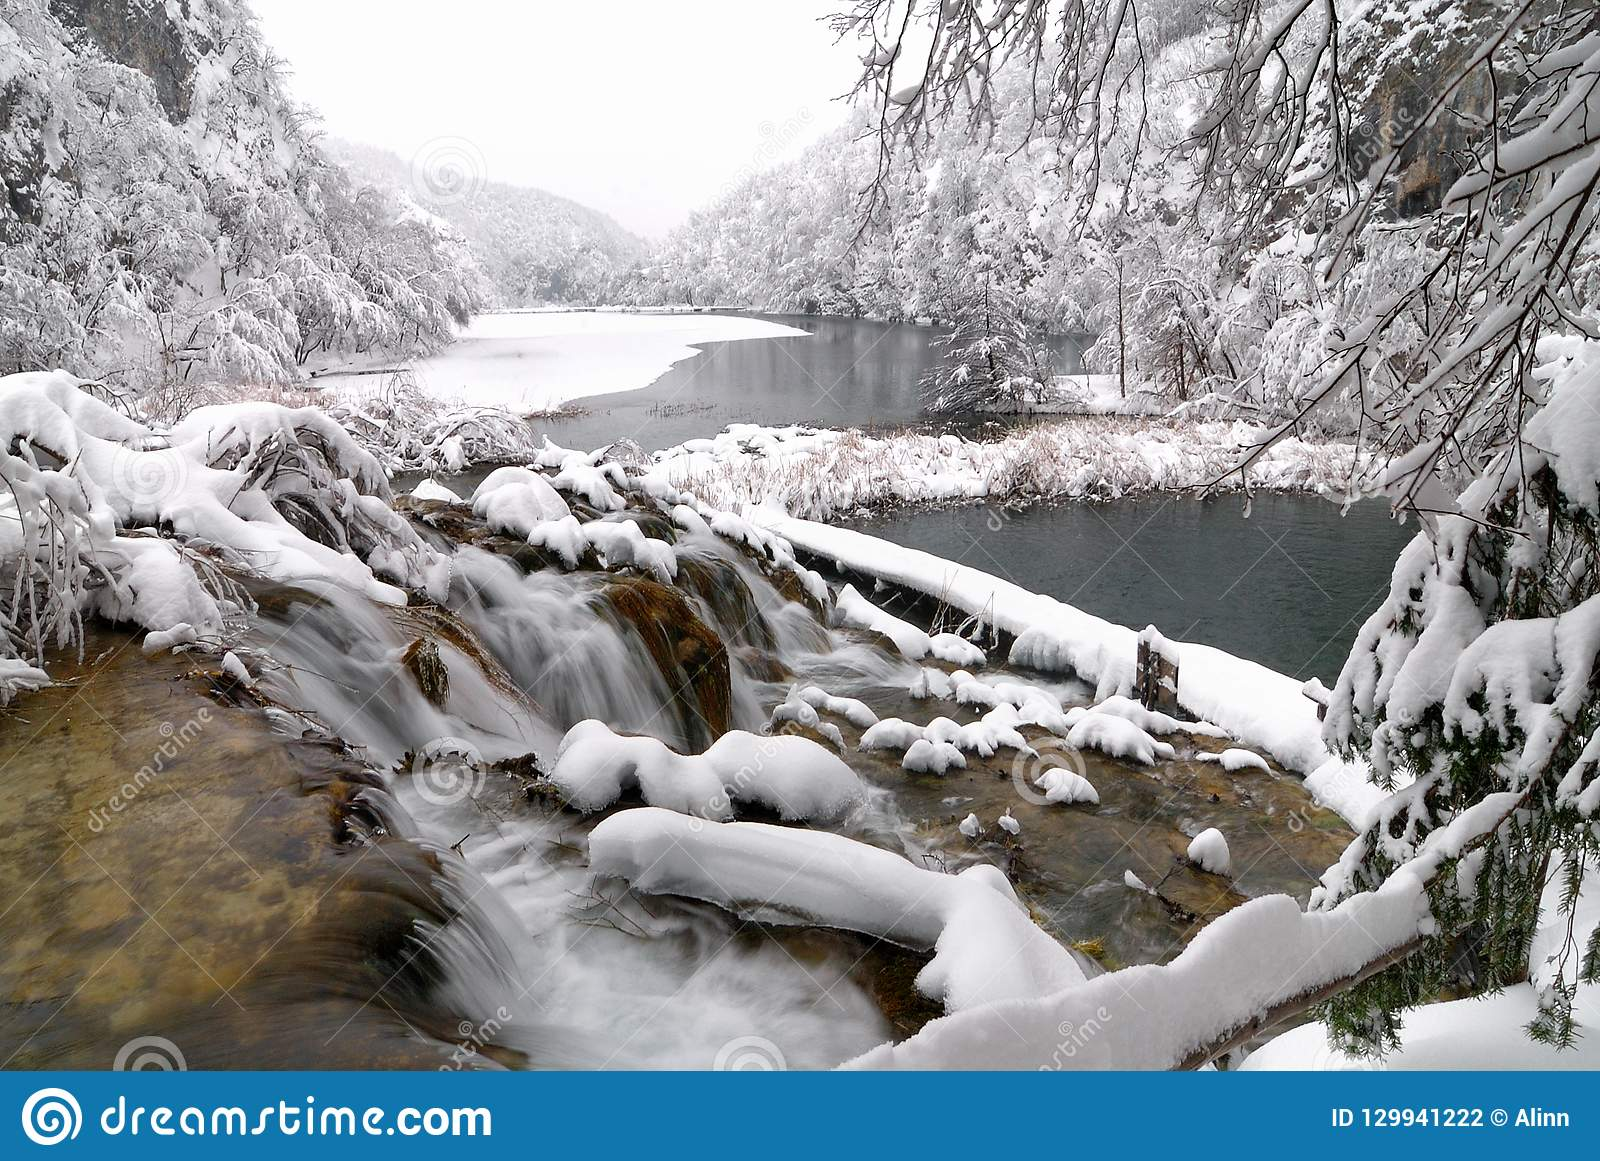 Plitvice Lakes In Winter Stock Photo Image Of White 129941222